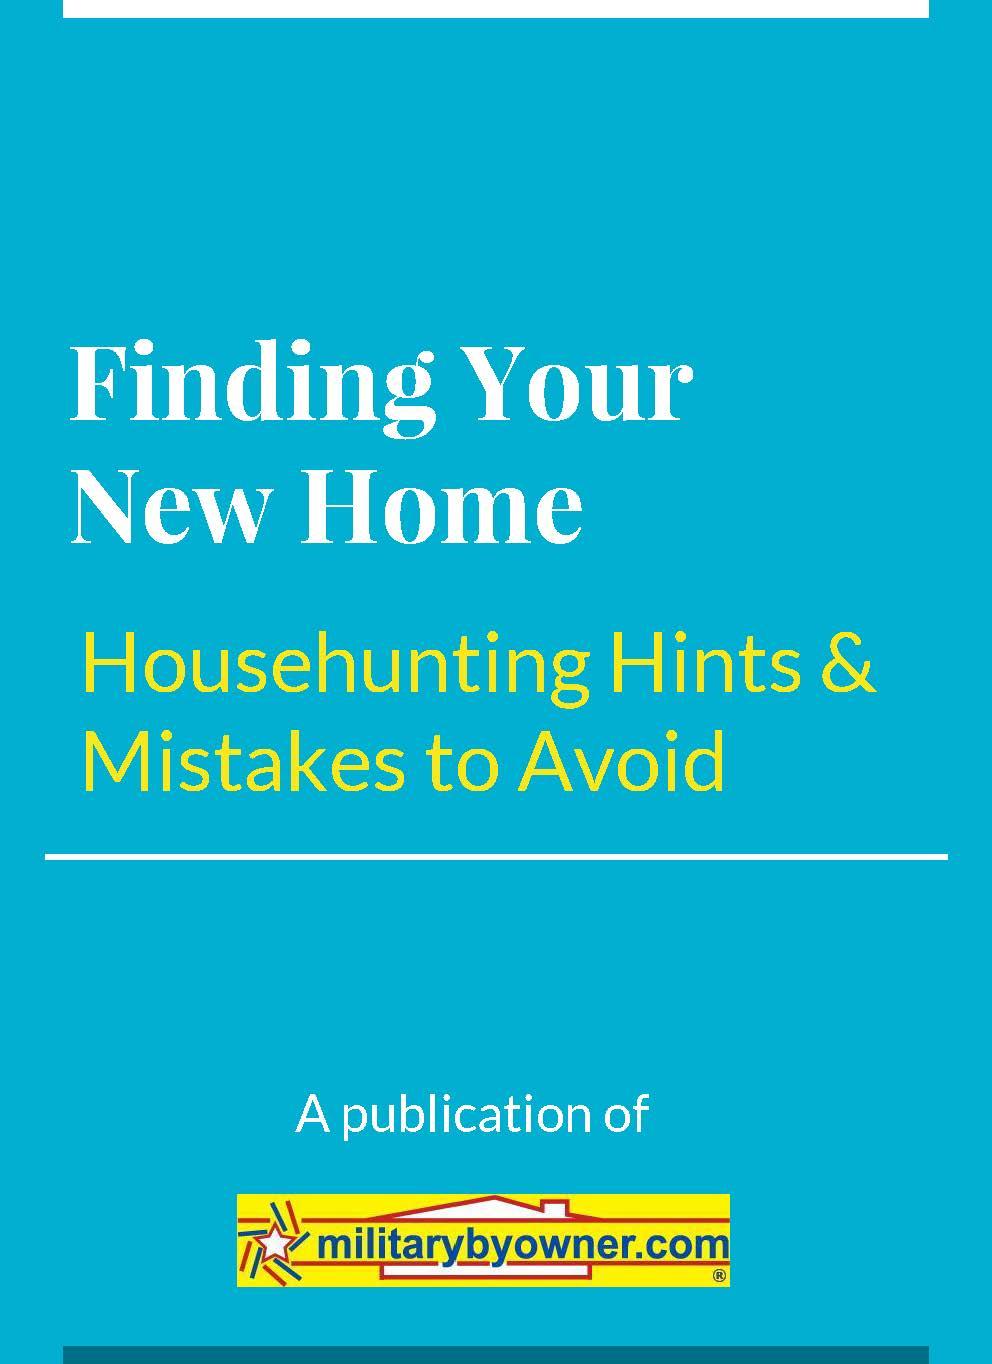 House_hunting_ebook_cover.jpg